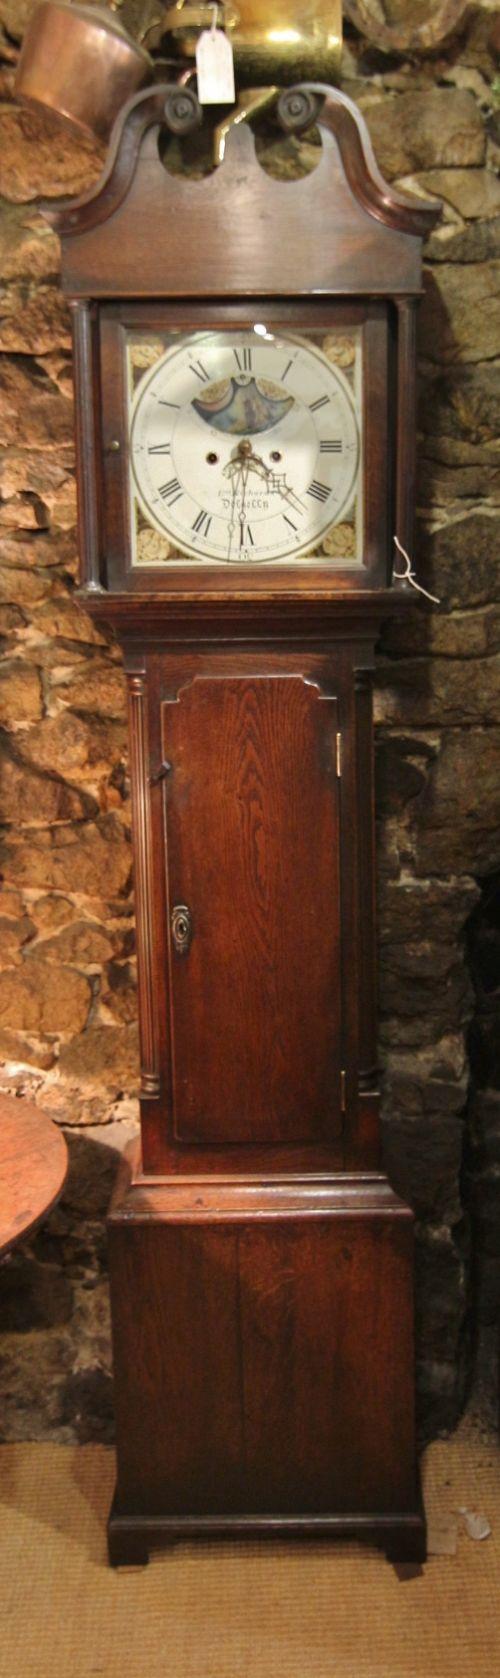 small 18th century welsh oak longcase clock 'e richards dollgellau'